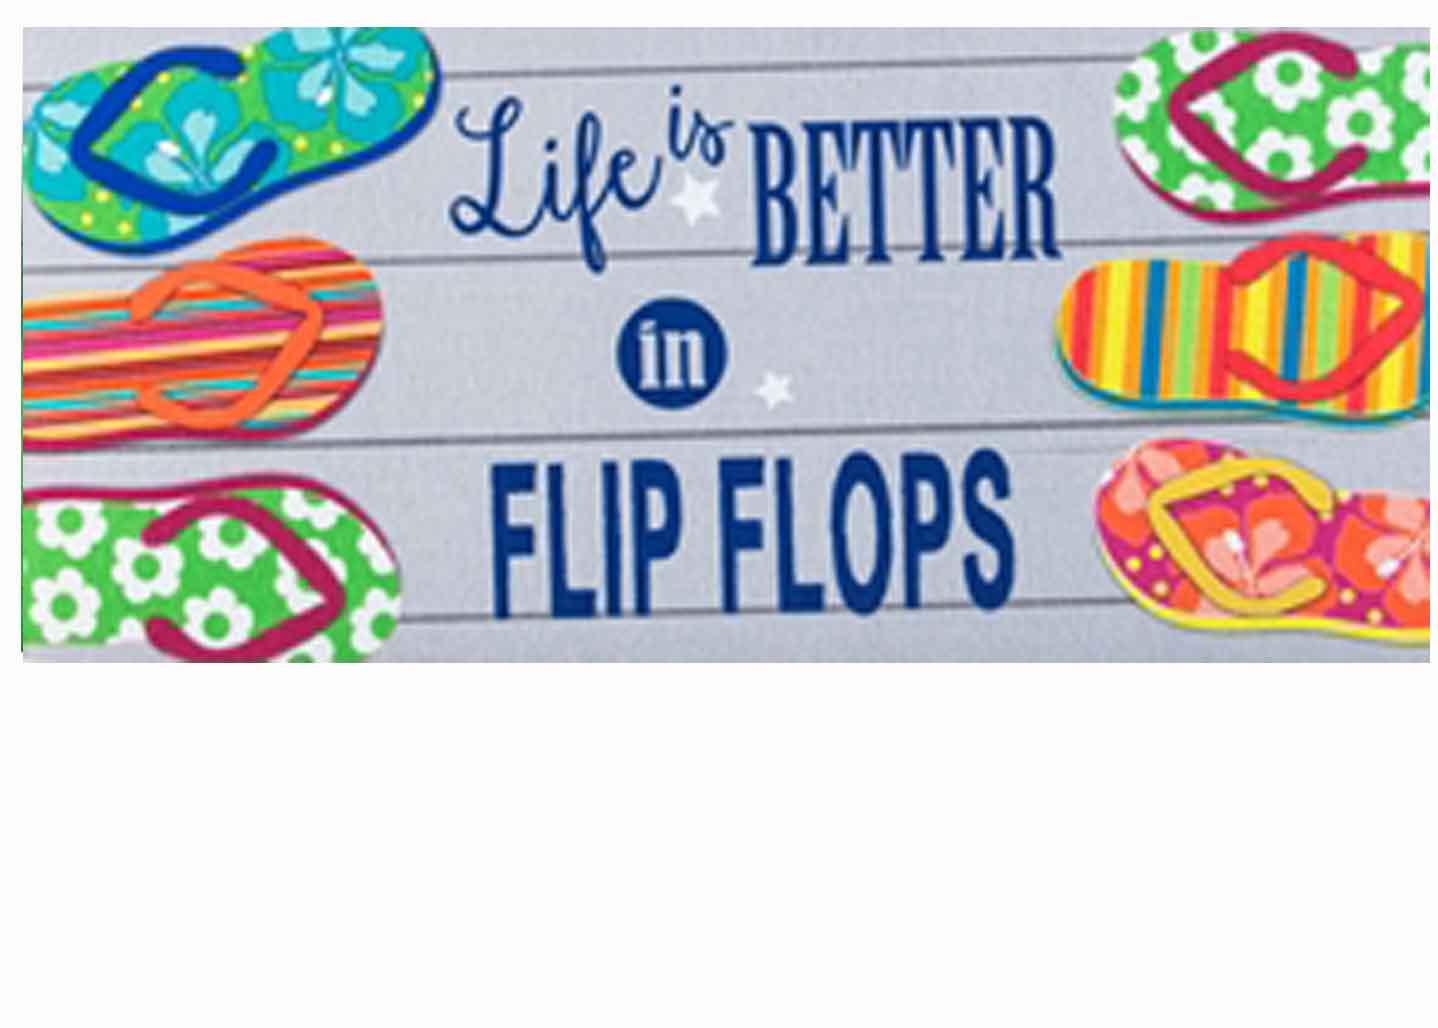 Sassafras Better In Flip Flops Mat 10 X 22 Insert Doormat